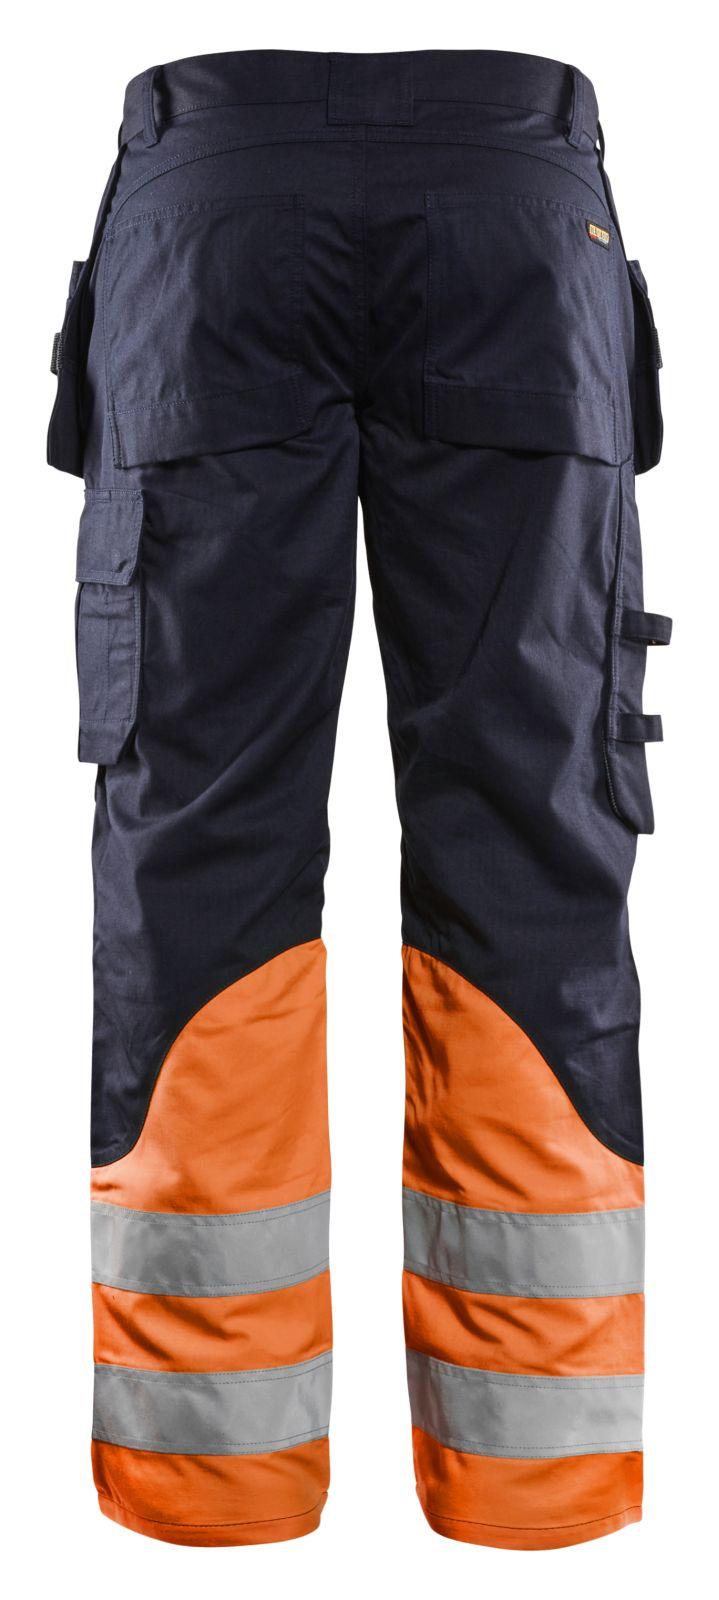 Blaklader Broeken 14891513 Multinorm marineblauw-oranje(8953)